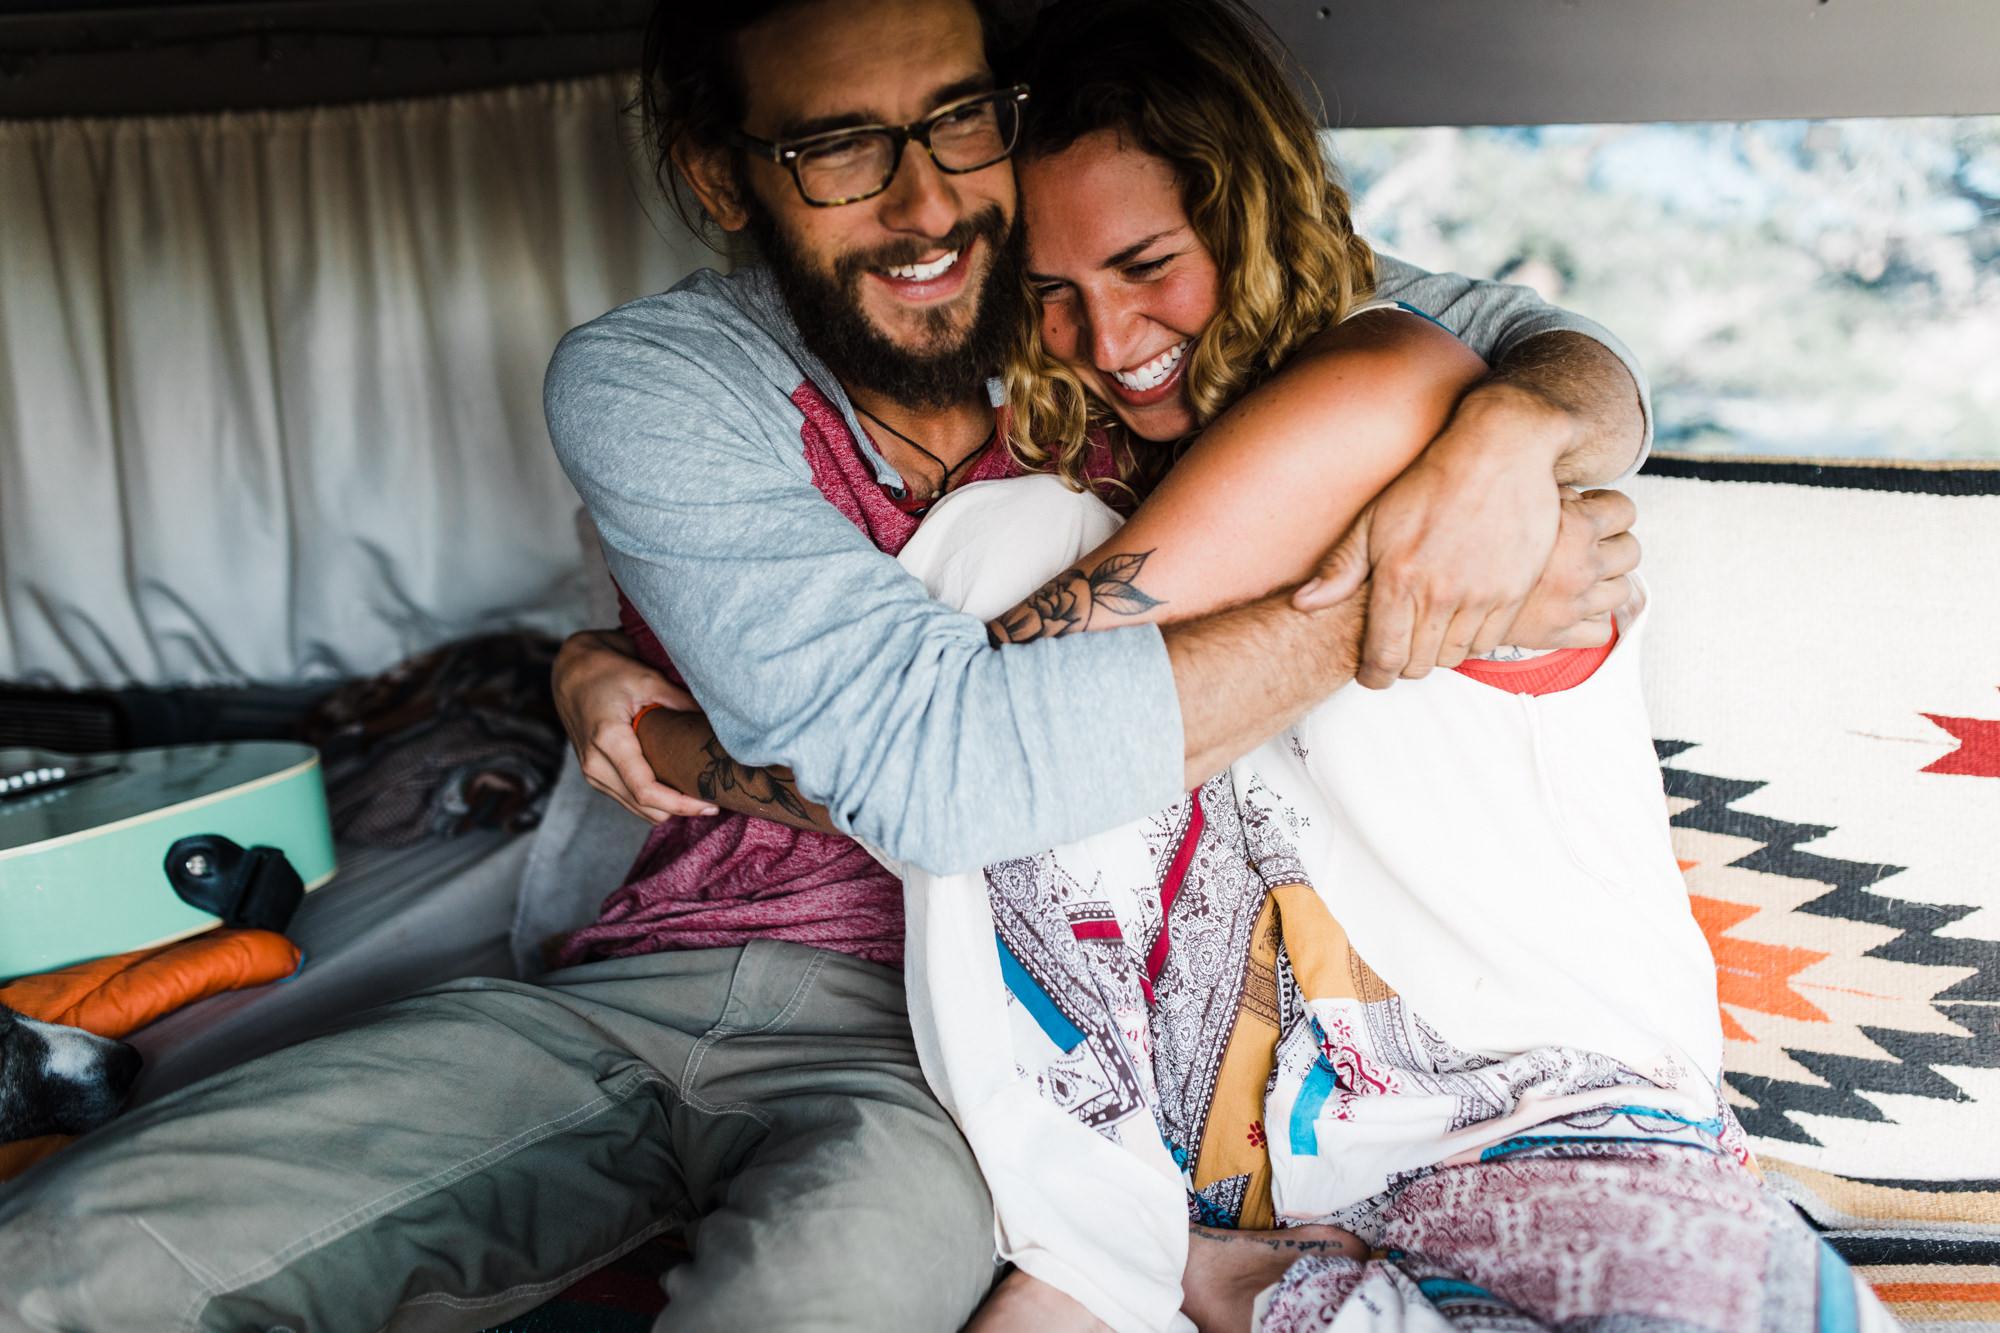 van life session in the utah desert | destination engagement photo inspiration | utah adventure elopement photographers | the hearnes adventure photography | www.thehearnes.com